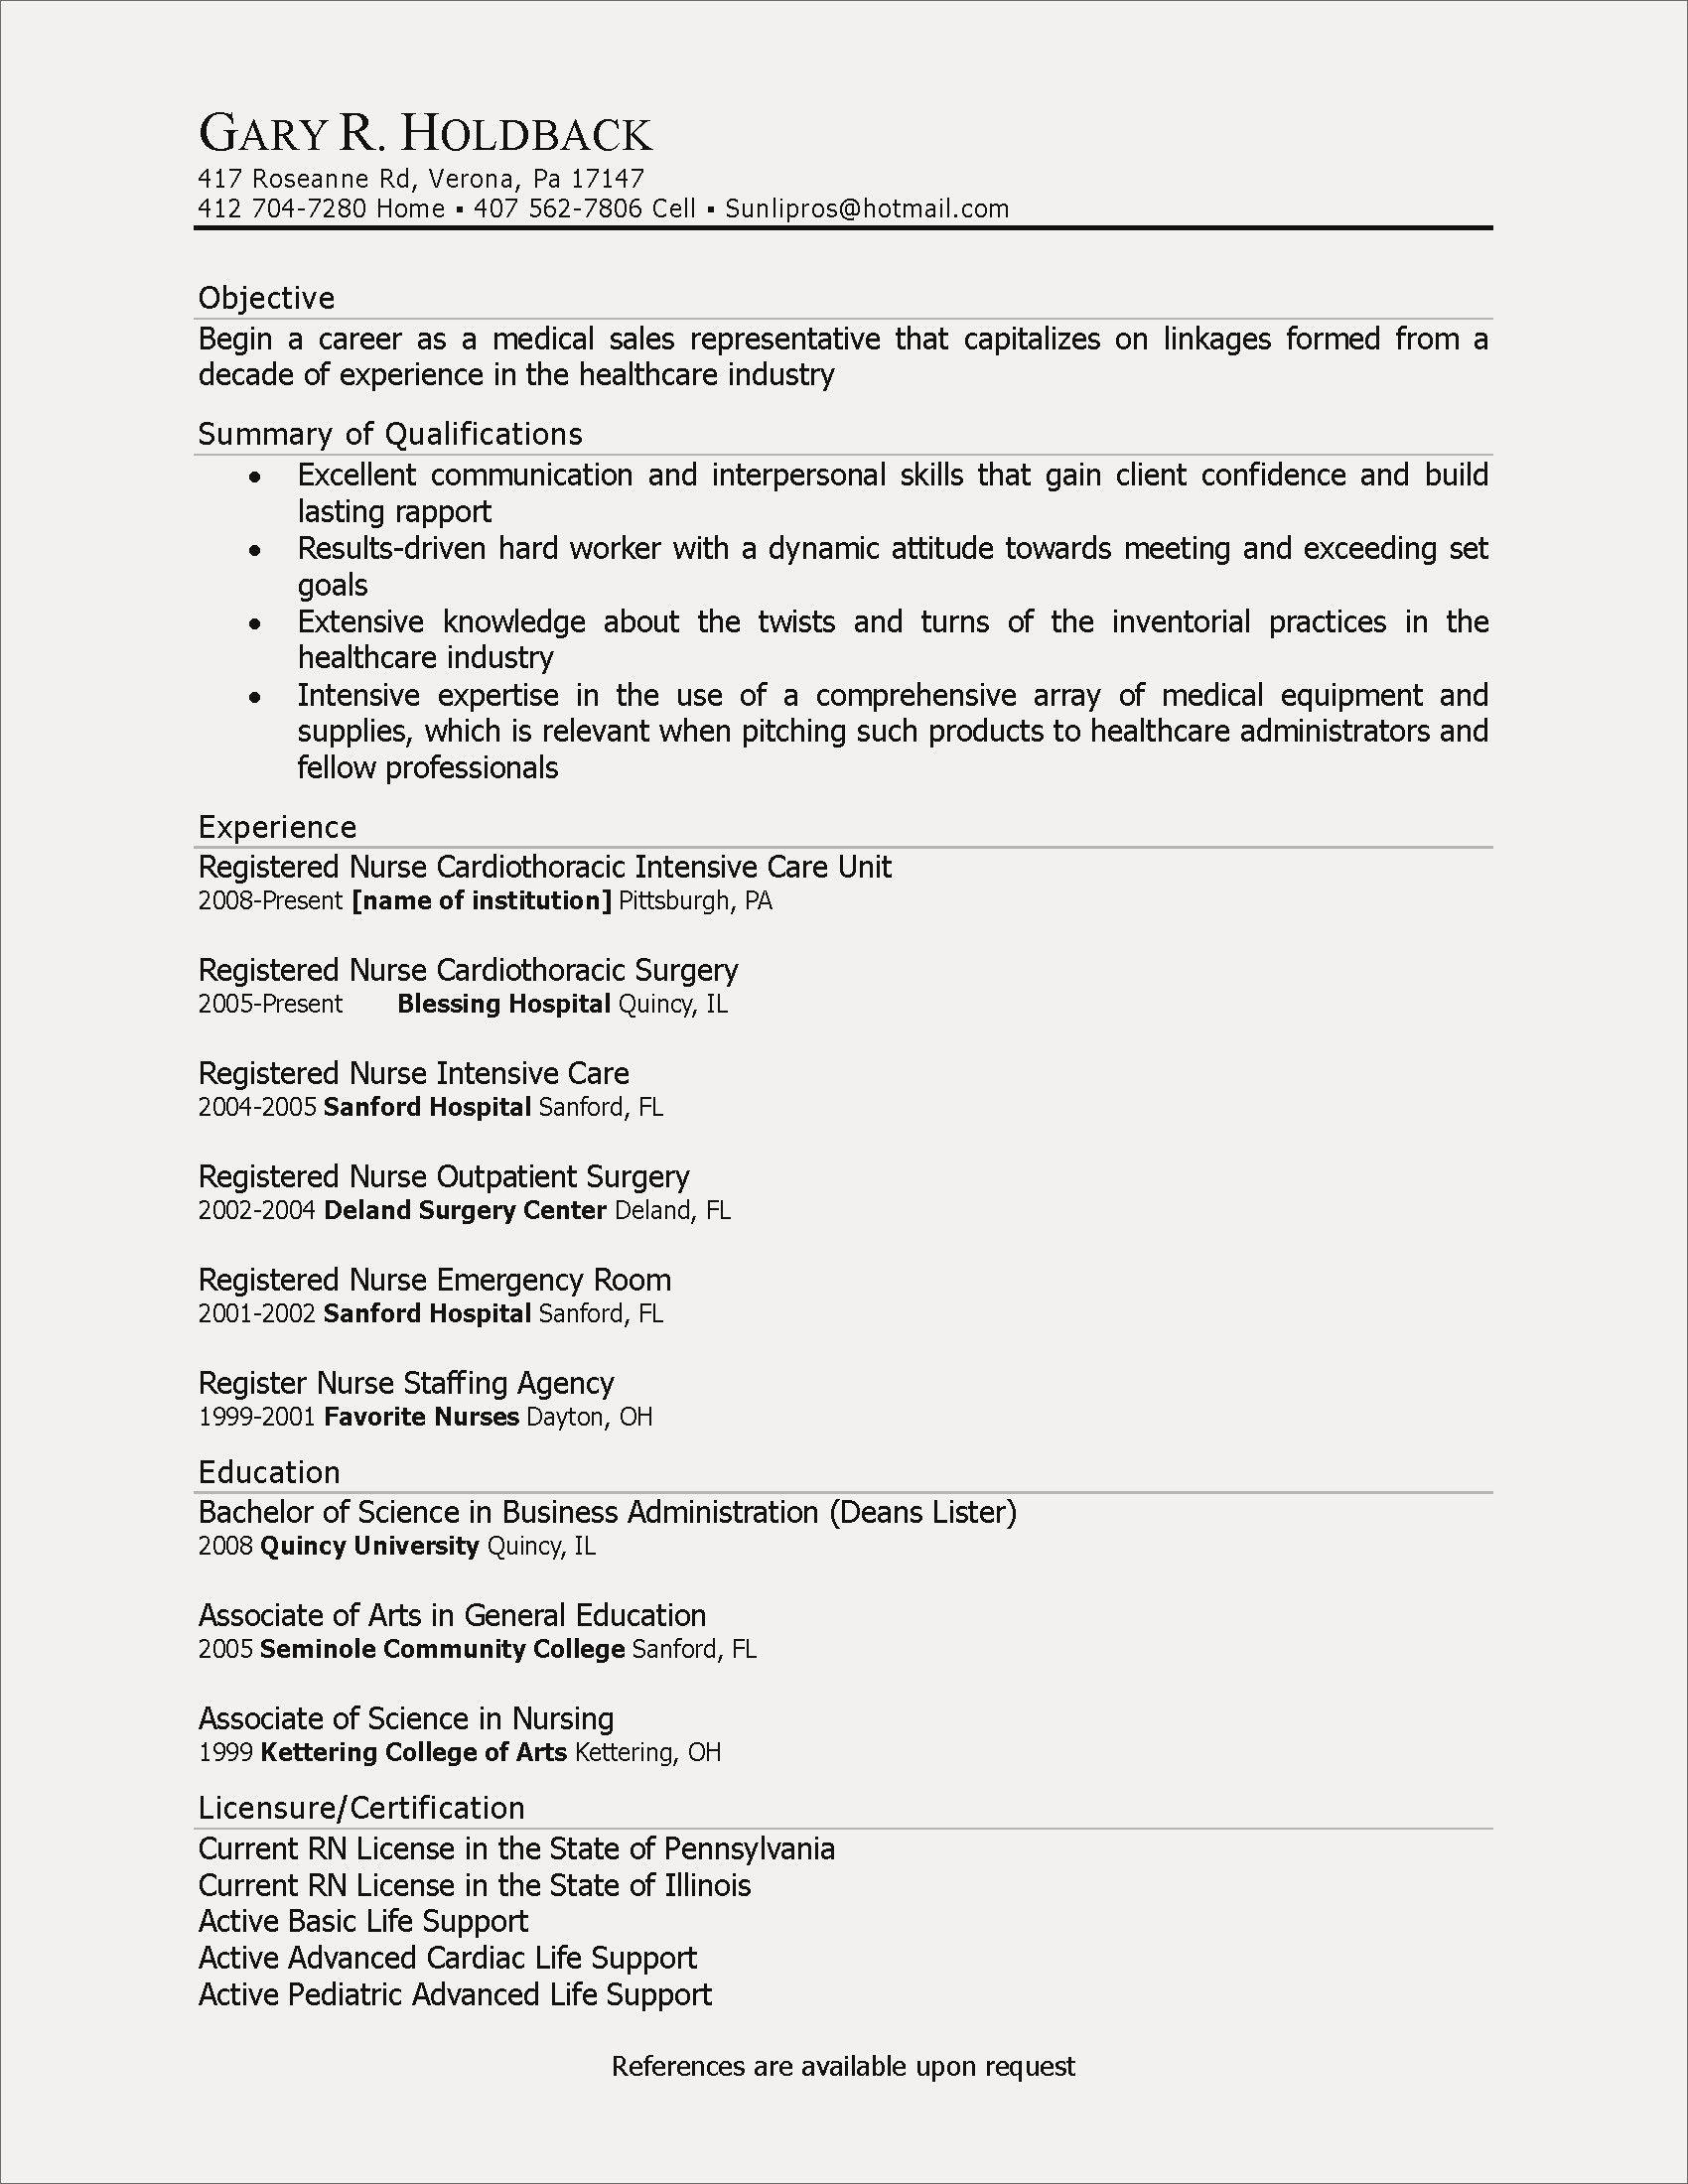 68 Inspiring Images Of Resume Sample For Enrolled Nurse Check More At Htt Career Objectives For Resume Resume Objective Statement Examples Career Change Resume